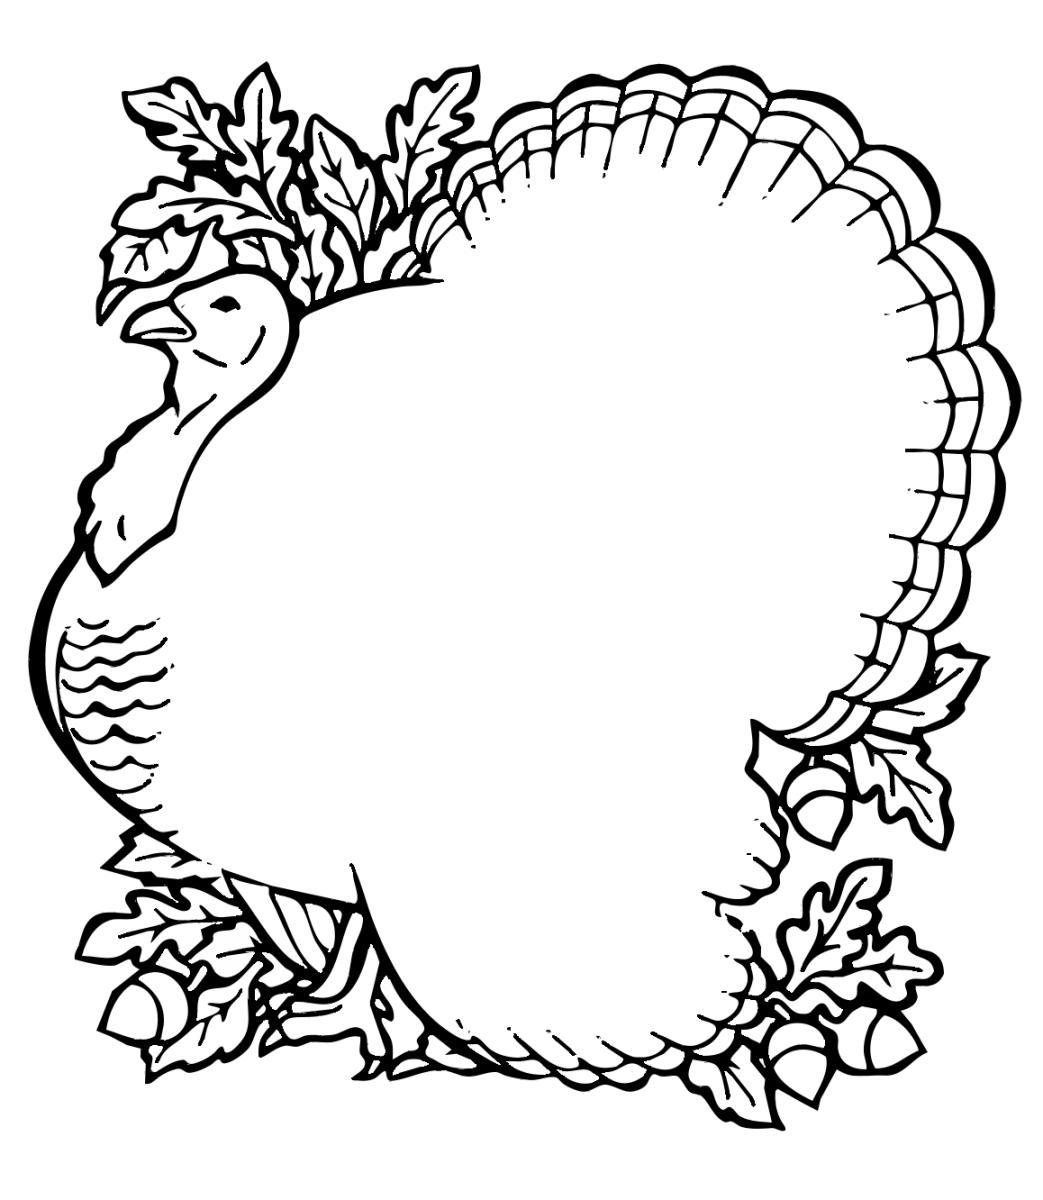 Turkey clipart shape #8